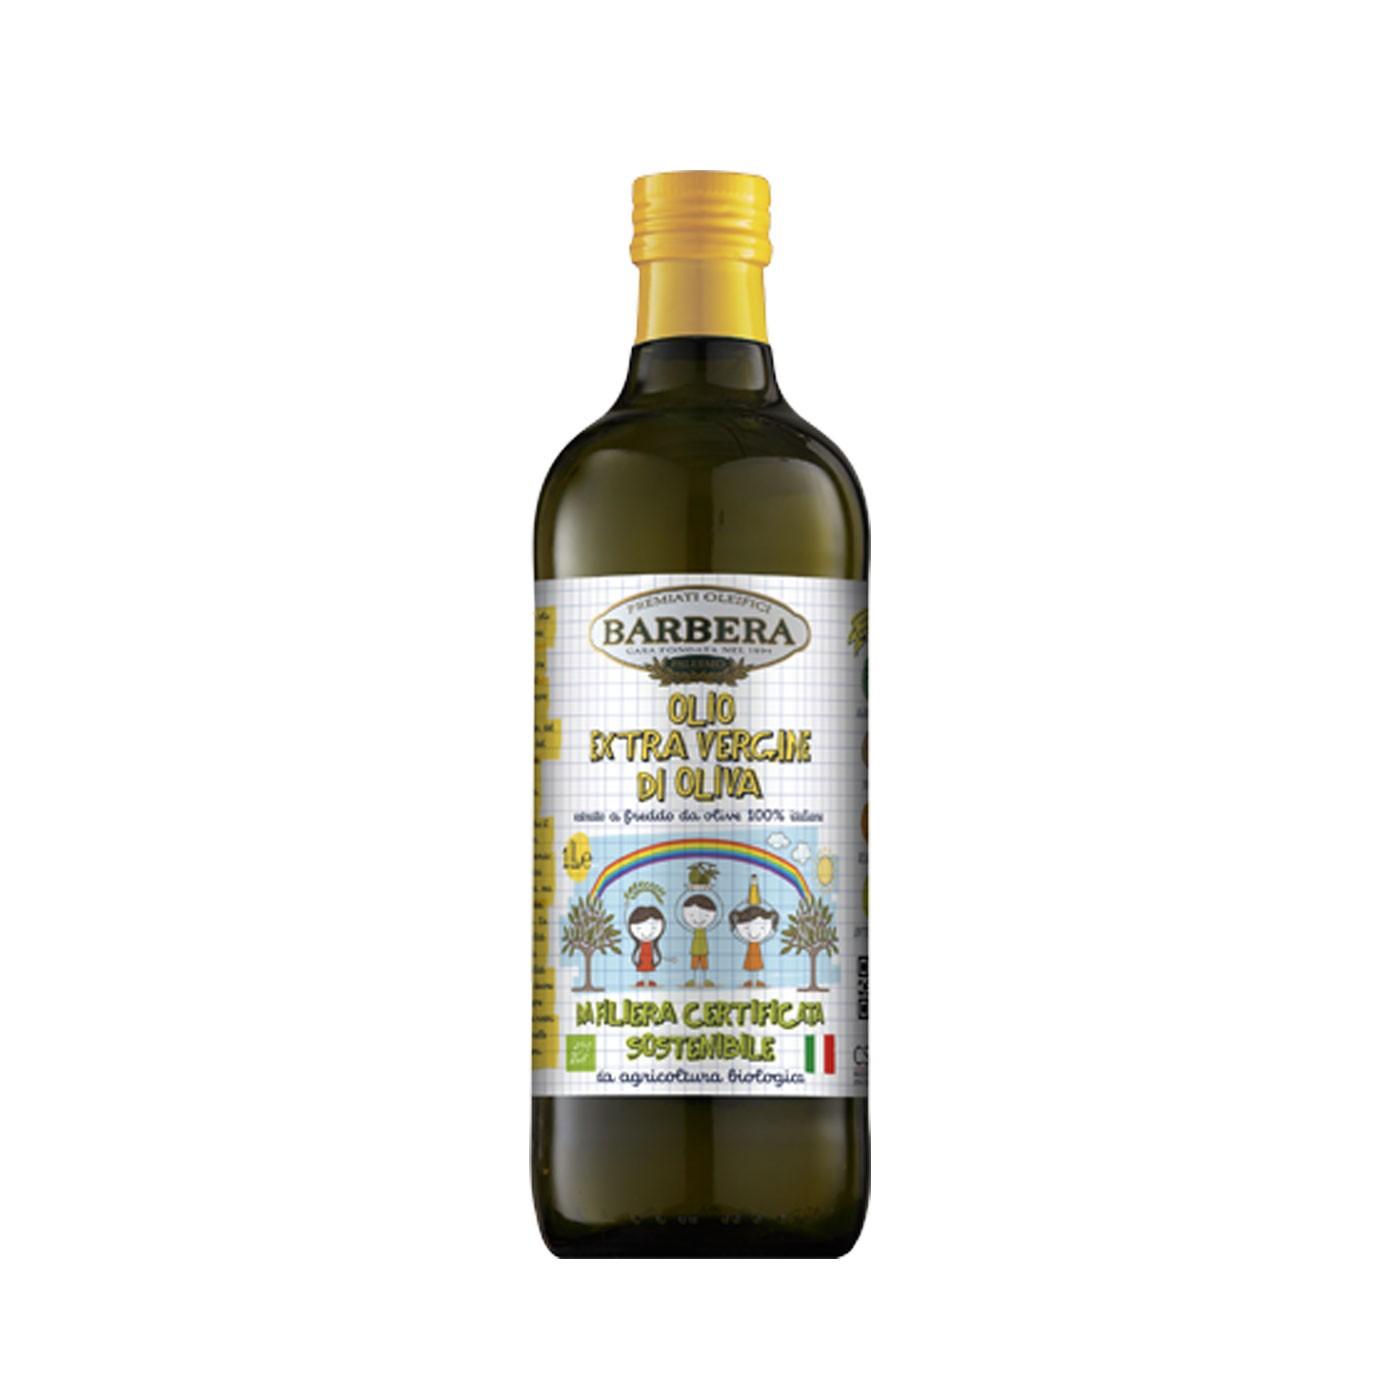 Organic Coratina Extra Virgin Olive Oil 33.8 oz - Premiati Oleifici Barbera | Eataly.com